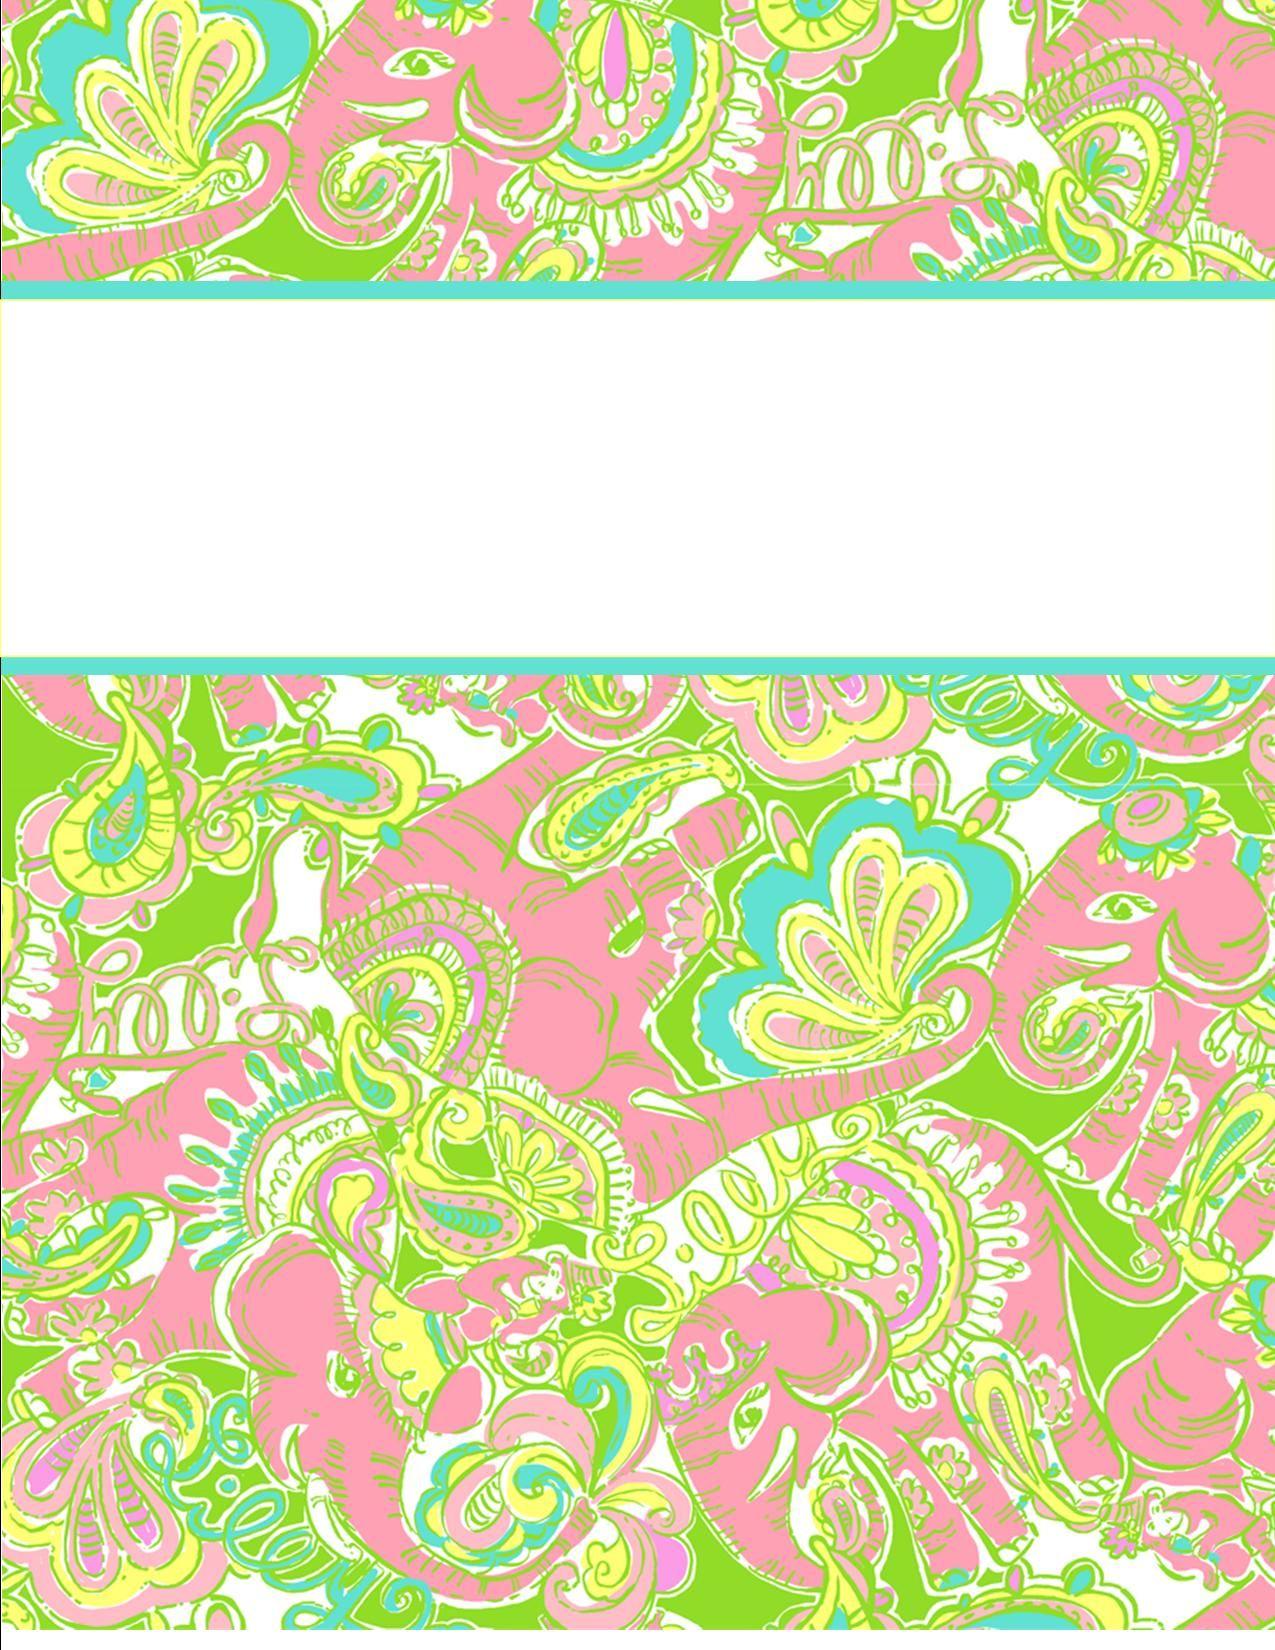 Book Cover Portadas Kawaii ~ My cute binder covers printable